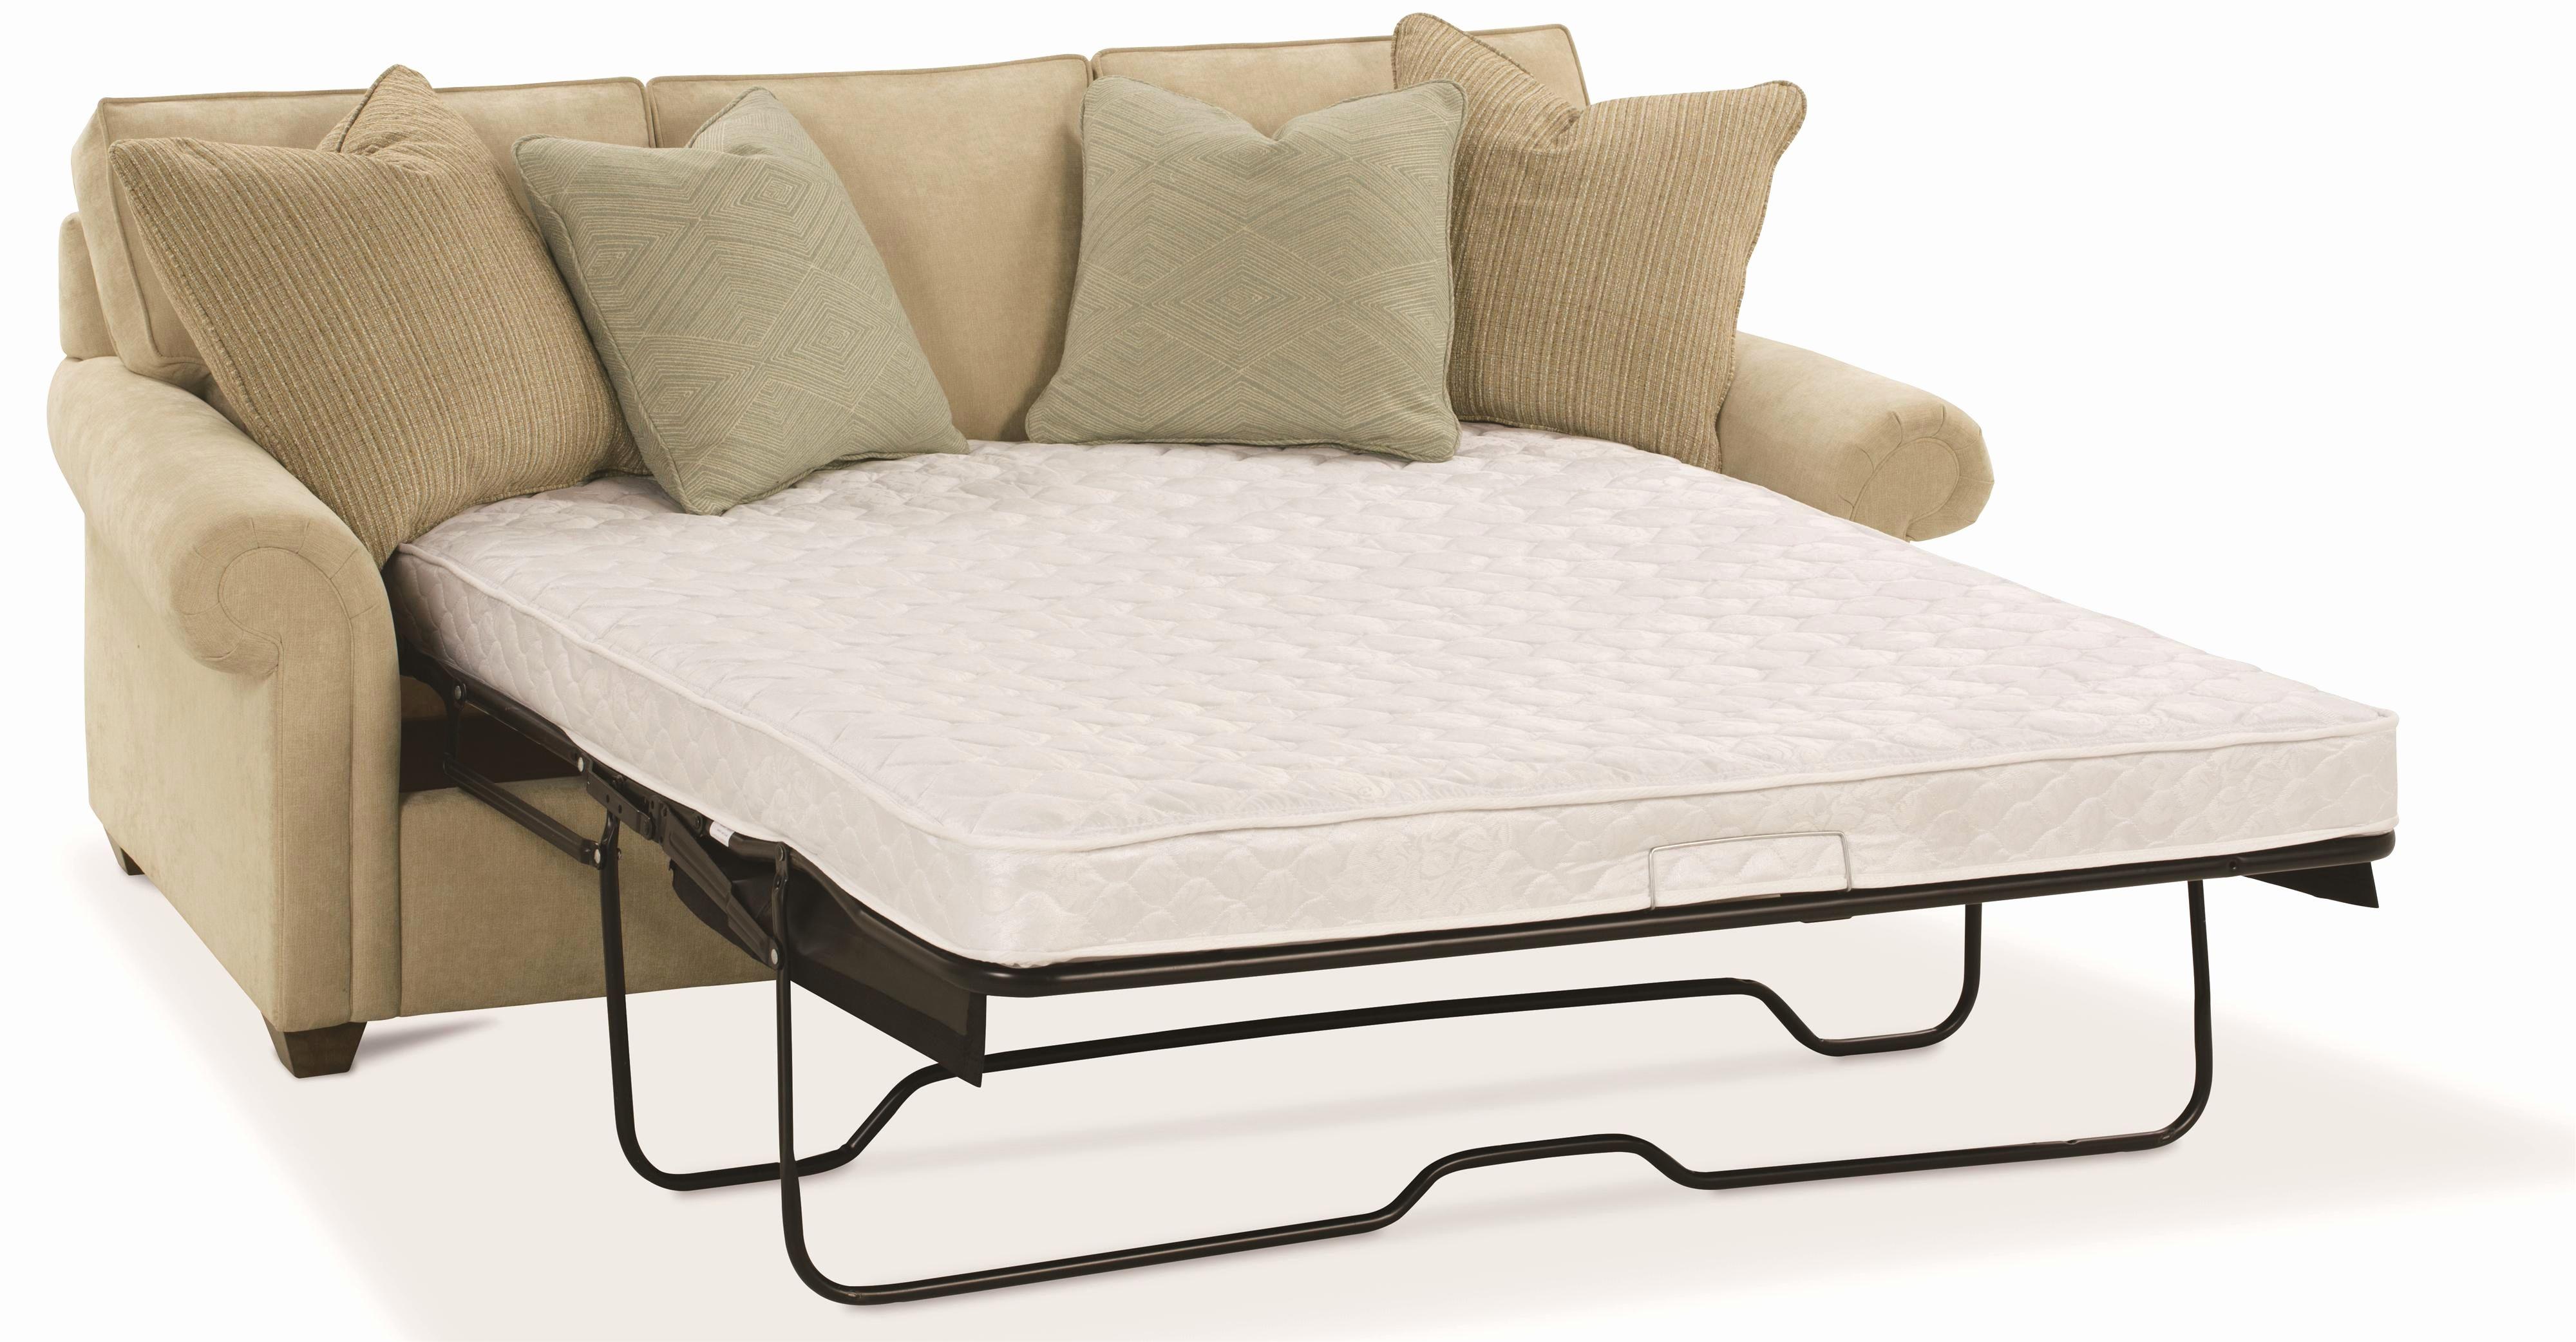 - Fresh Sleeper Sofa Mattresses Image Sleeper Sofa Mattresses